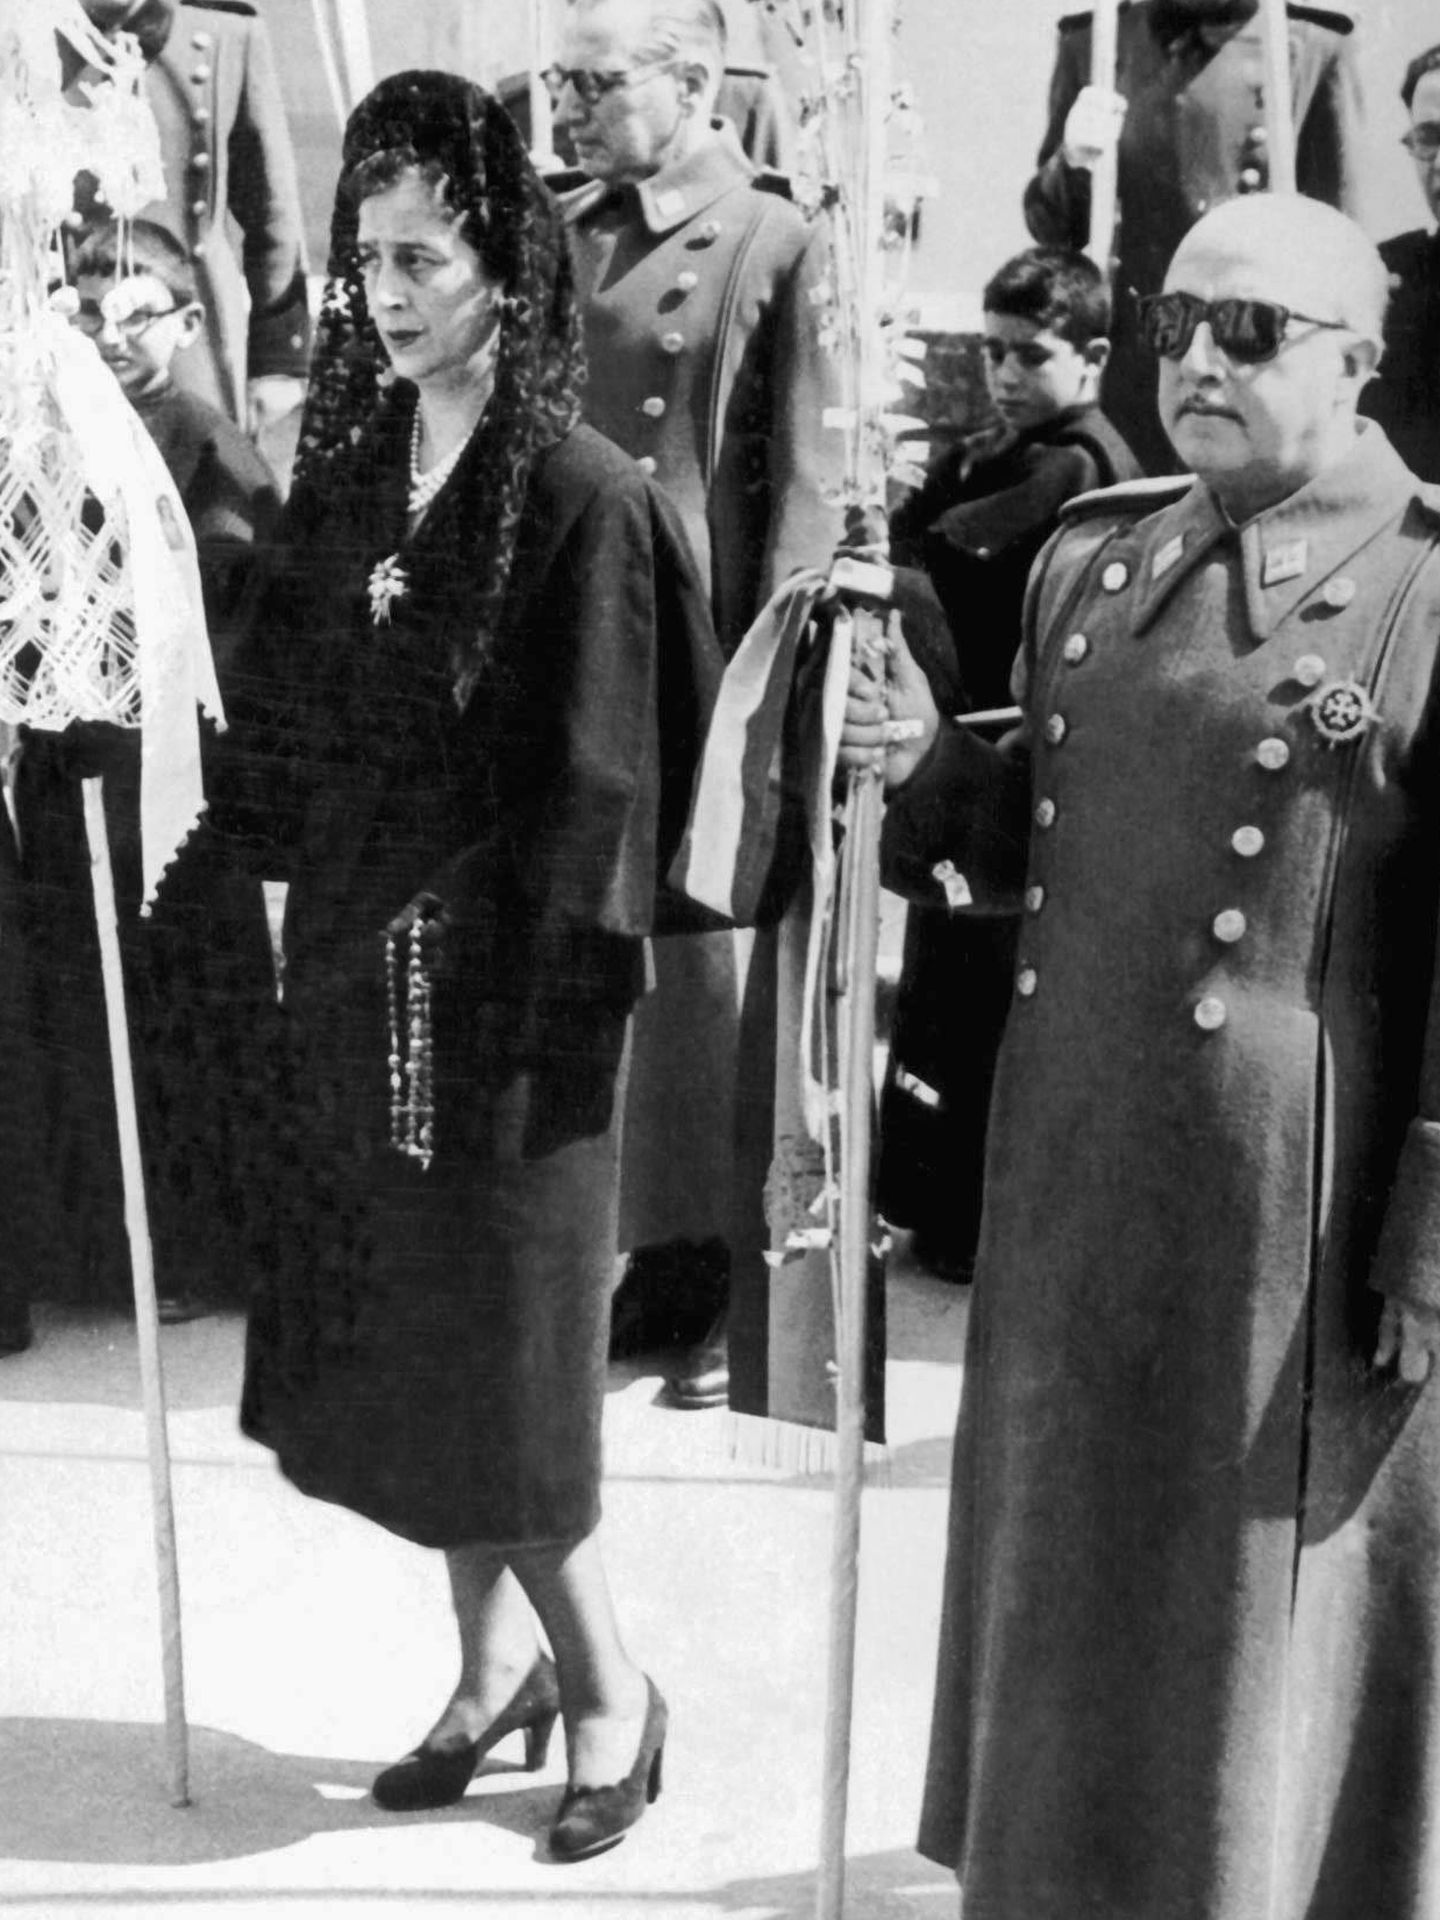 Franco y Carmen Polo. (Cordon Press)